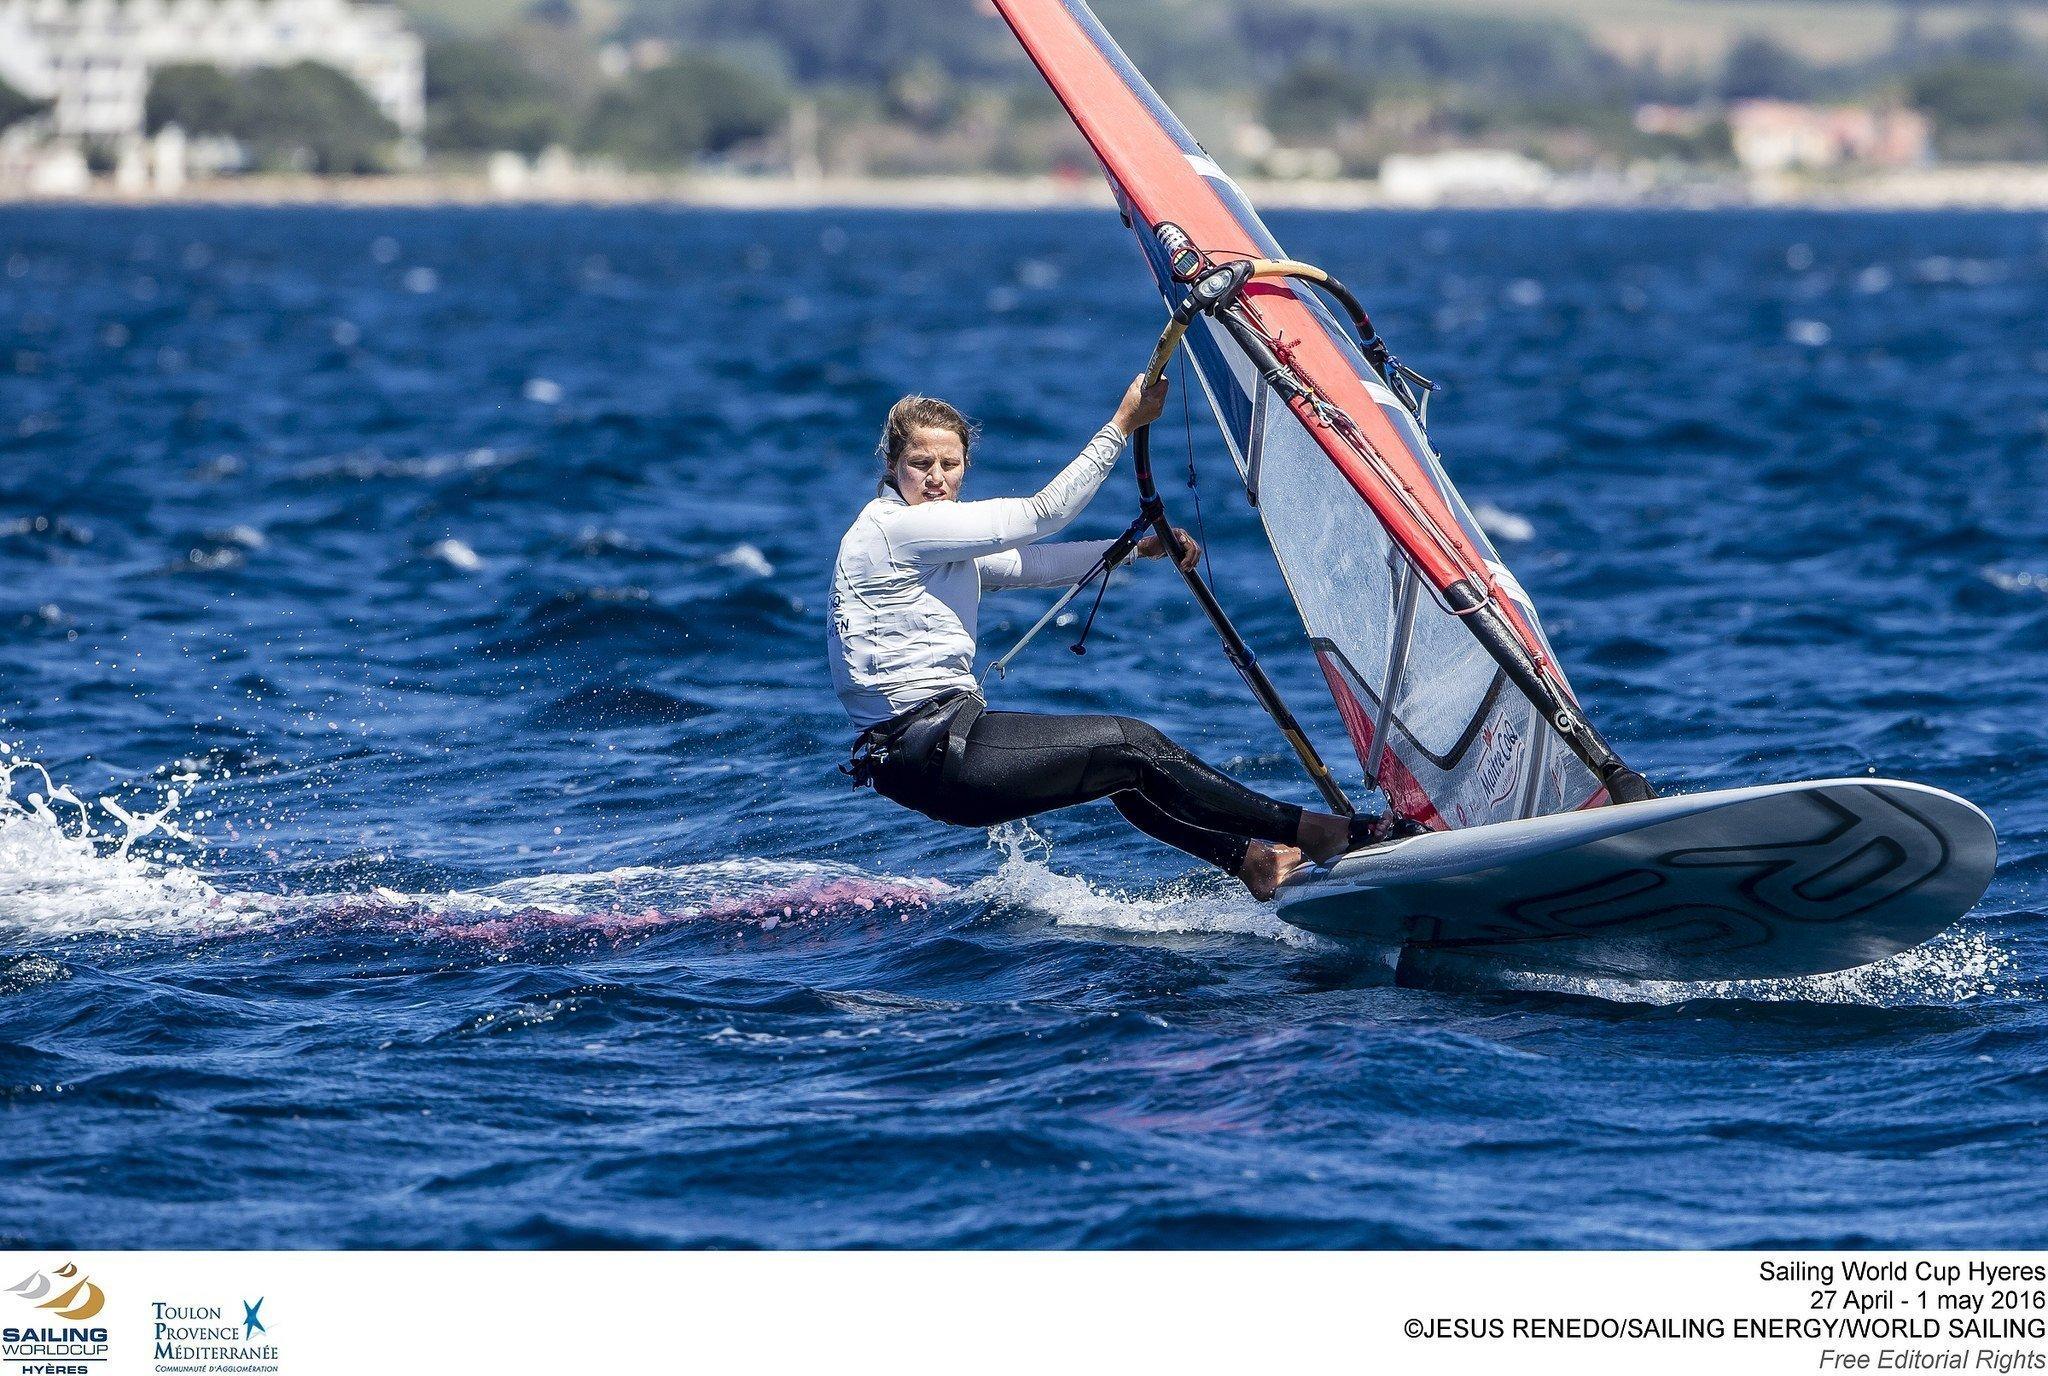 2015-04-26 Hélène Noesmoen – Training – ISAF Sailing World Cup Hyères – Crédit Photo Jesus Renedo – Sailing Energy – World Sailing